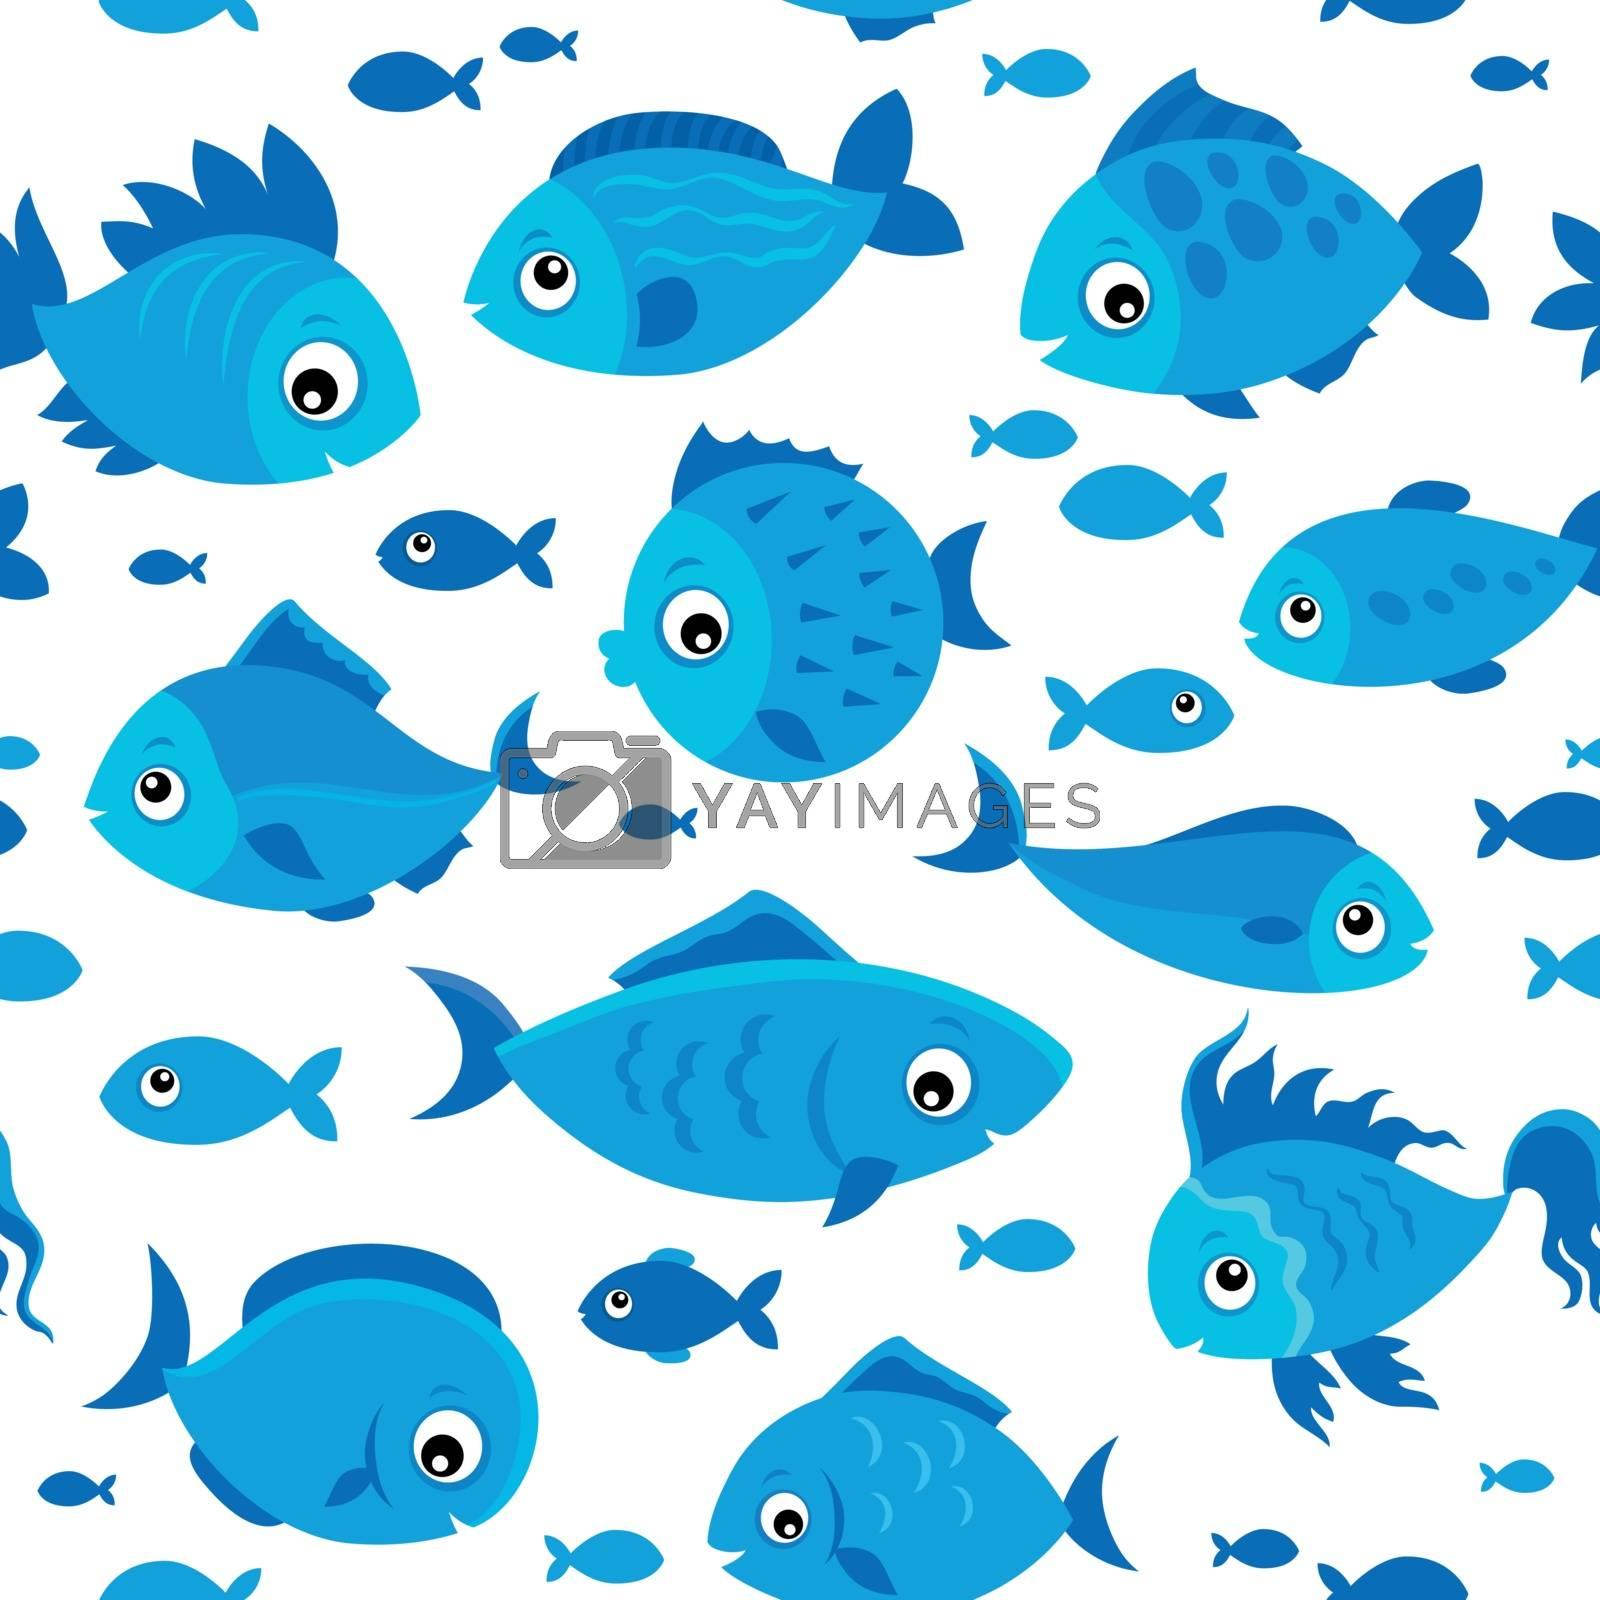 Seamless background stylized fishes 6 - eps10 vector illustration.